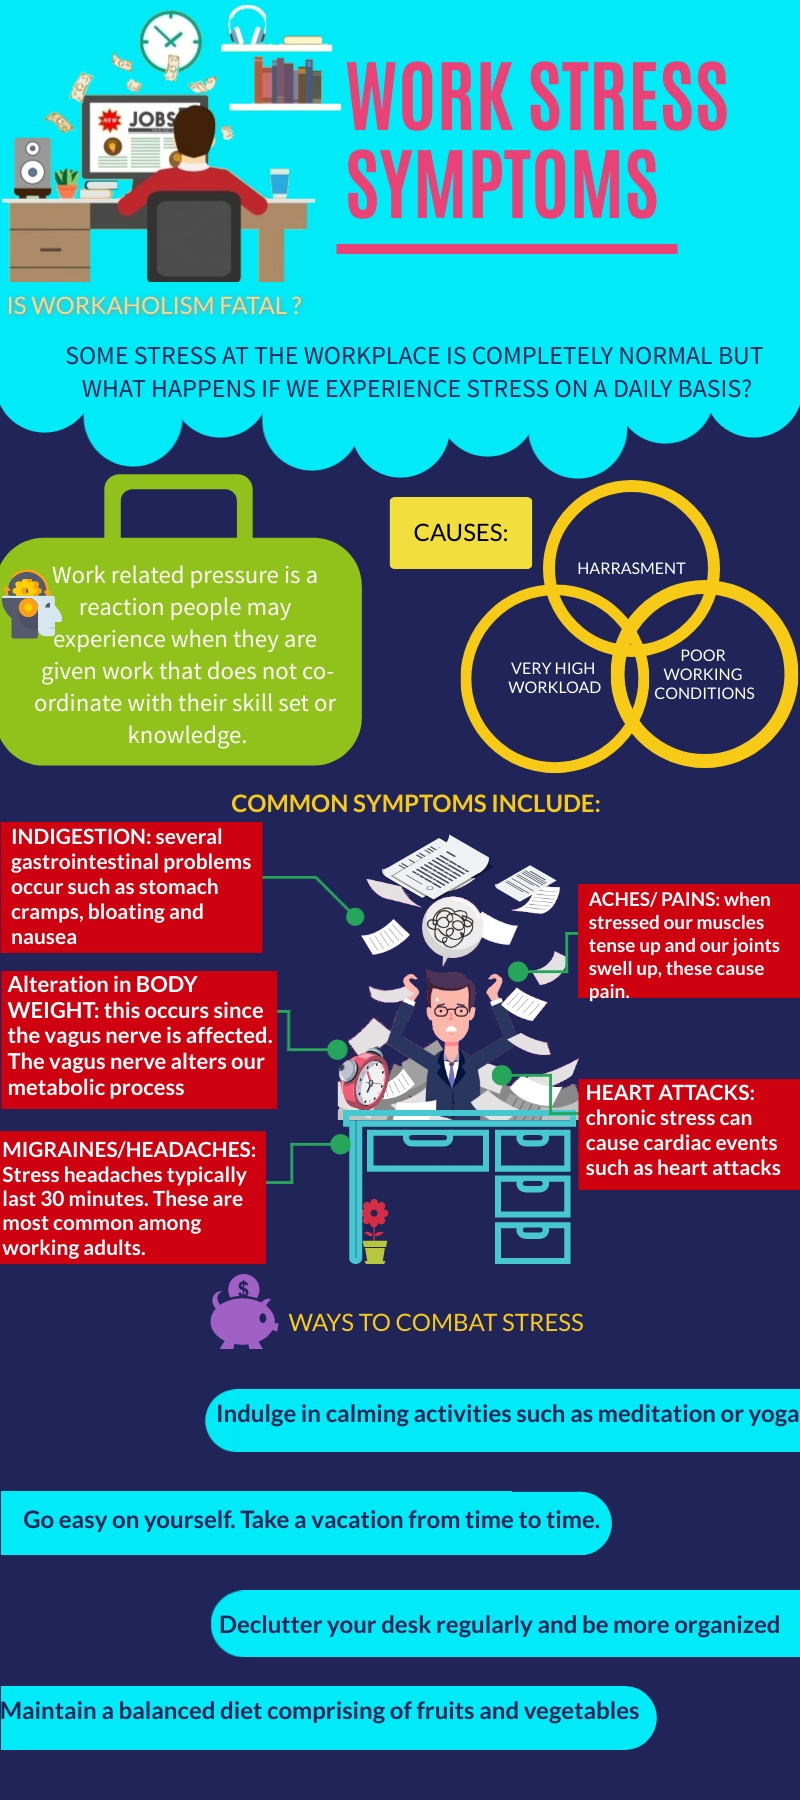 Symptoms of Work Stress